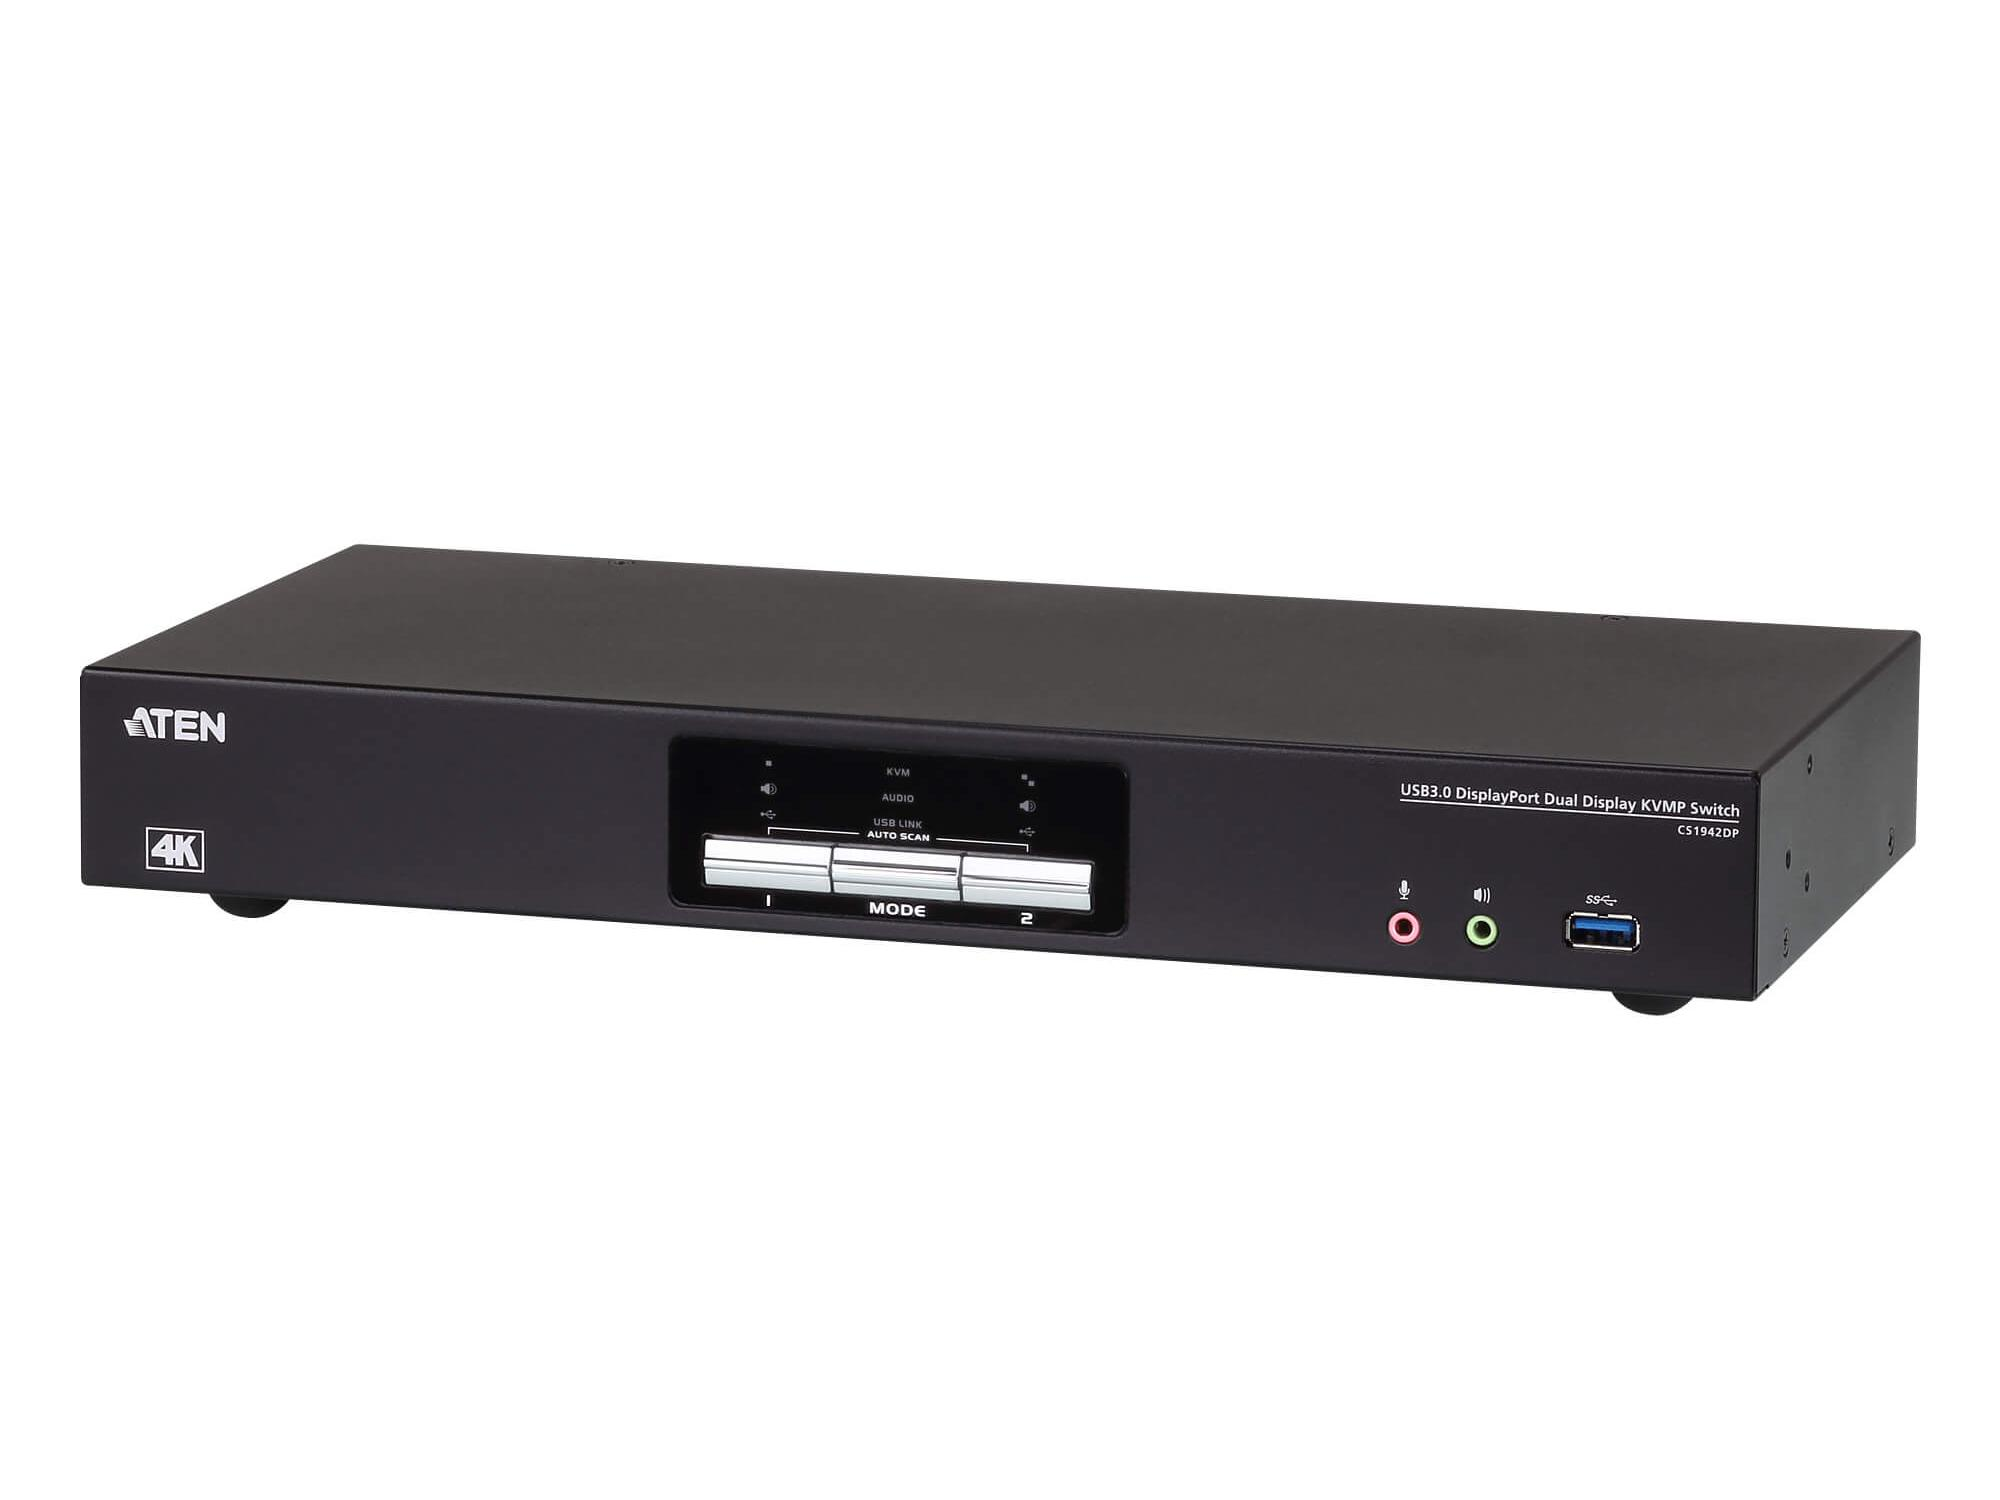 Aten CS1942DP 2-Port USB 3.0 4K DisplayPort Dual Display KVMP Switch